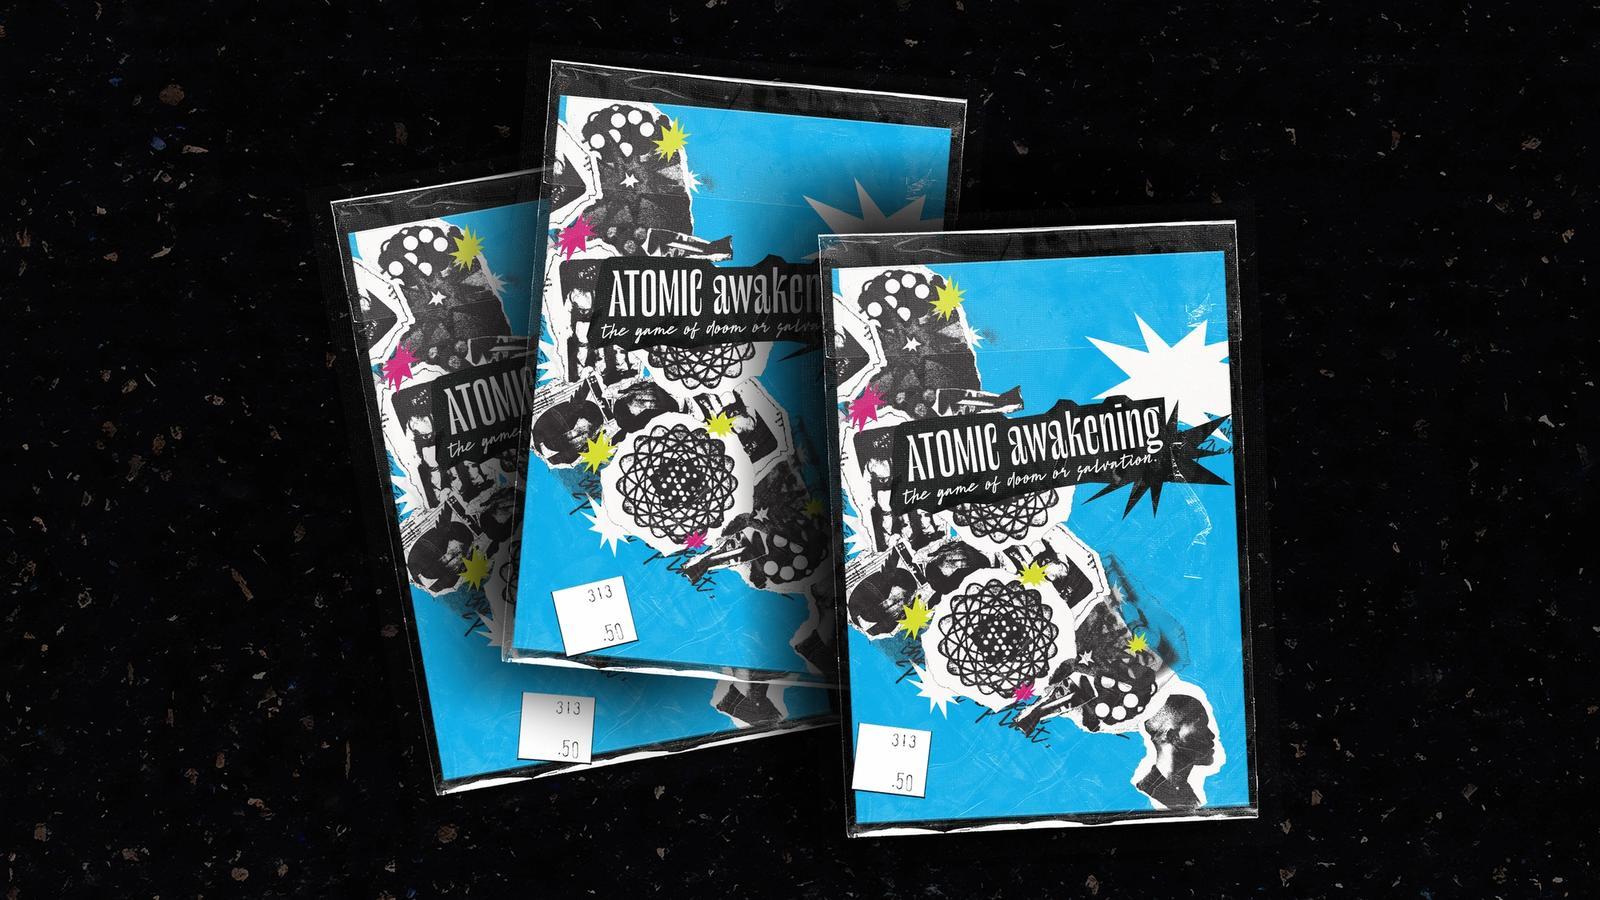 Atomic Awakenings awareness campaign